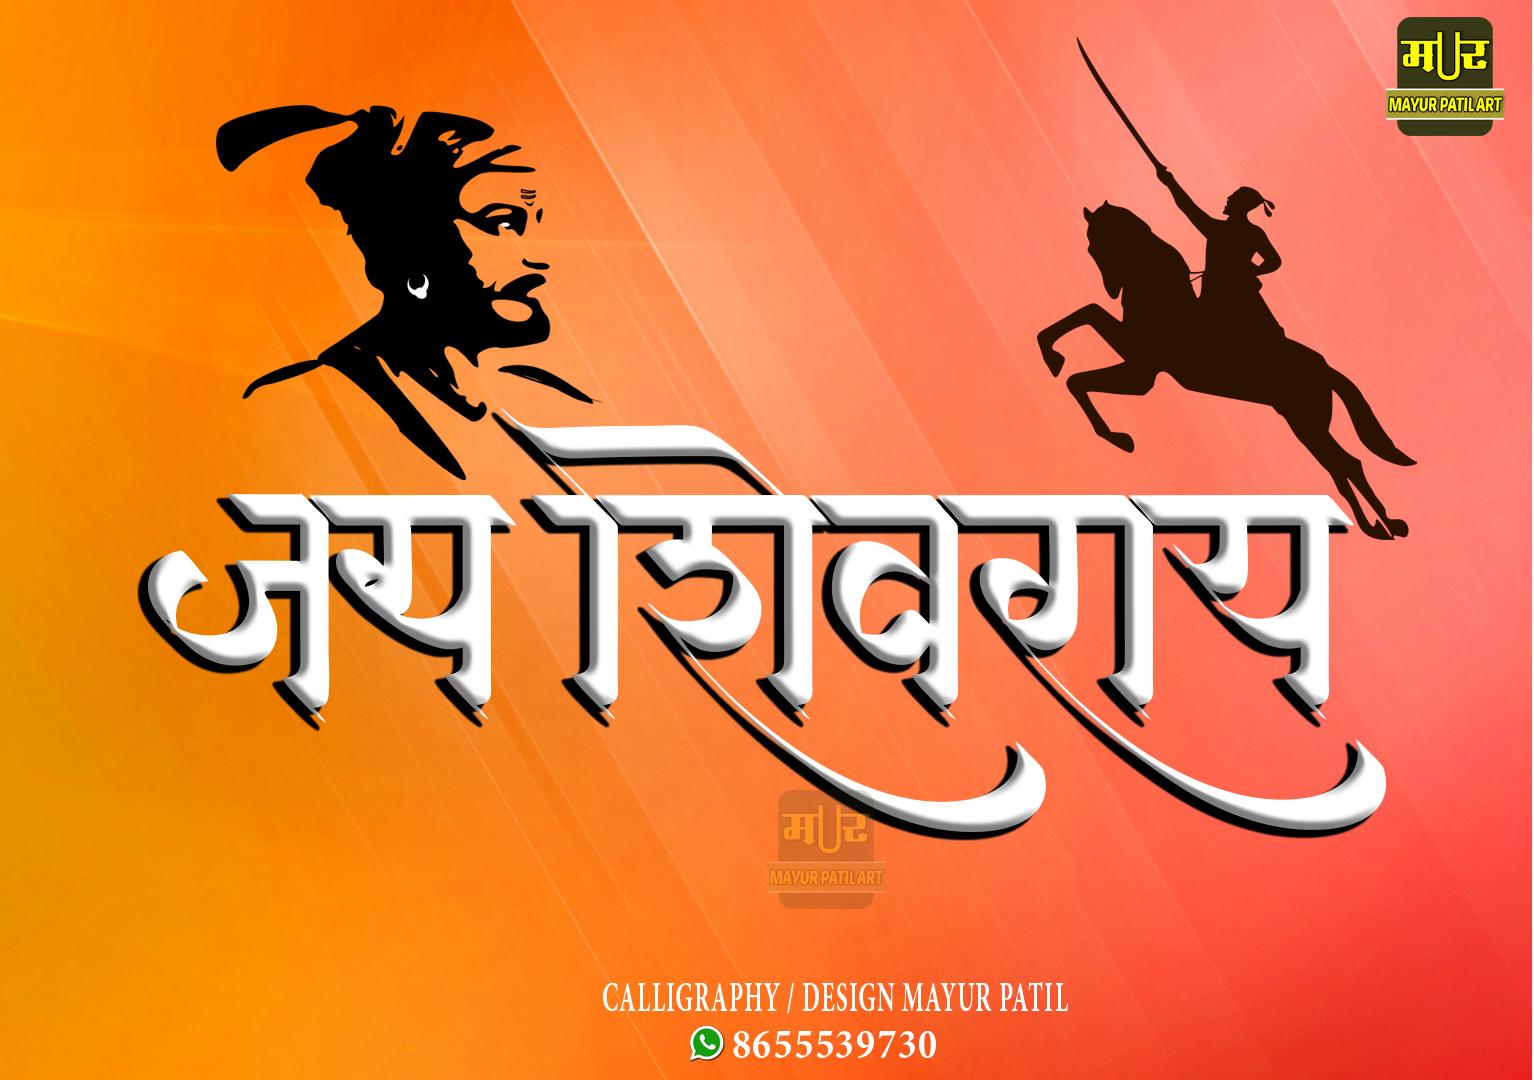 Jay shivray calligraphy by mayur patil - MAYUR PATIL ART